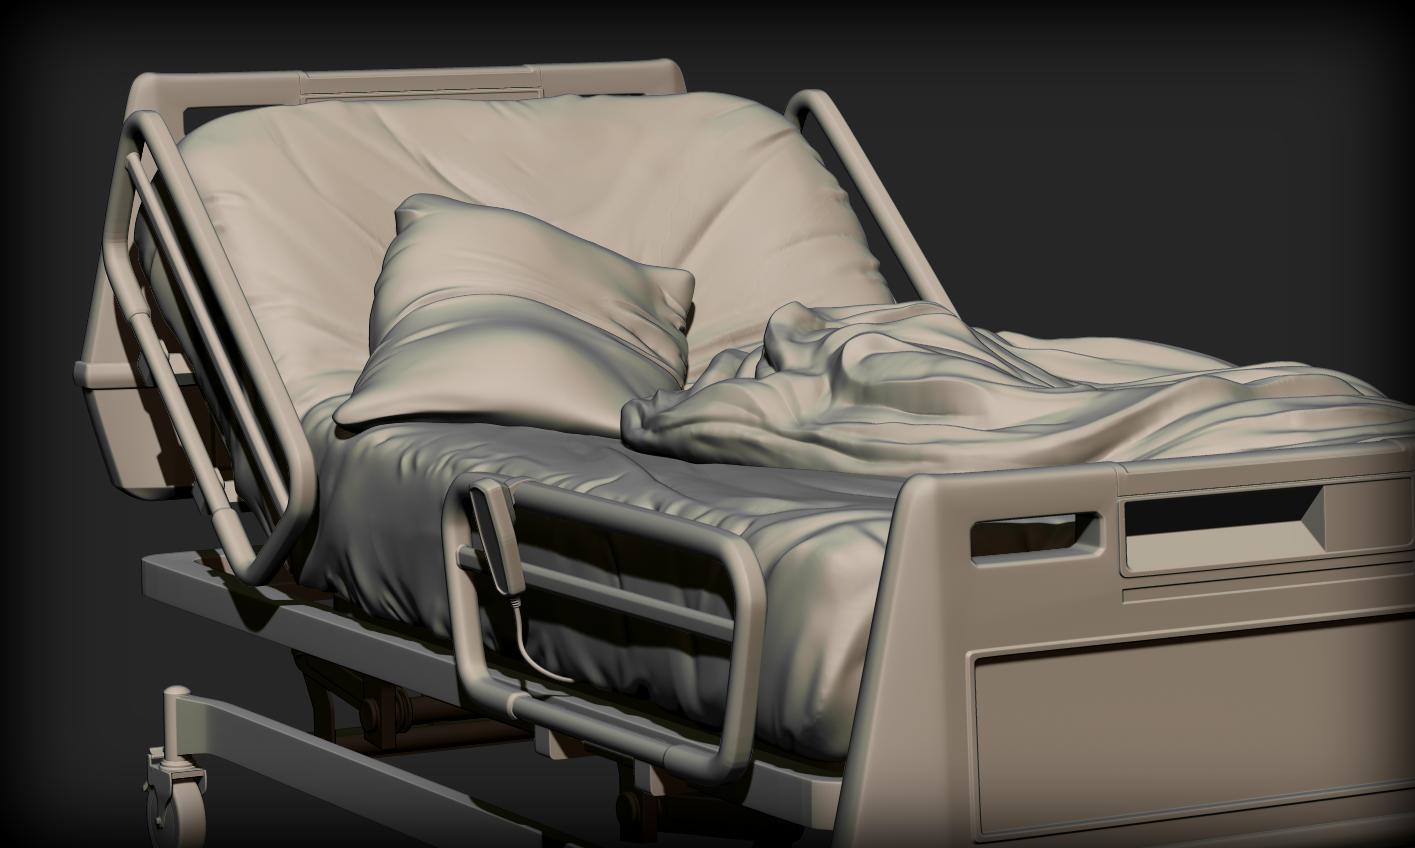 hospitalbed_render3.png